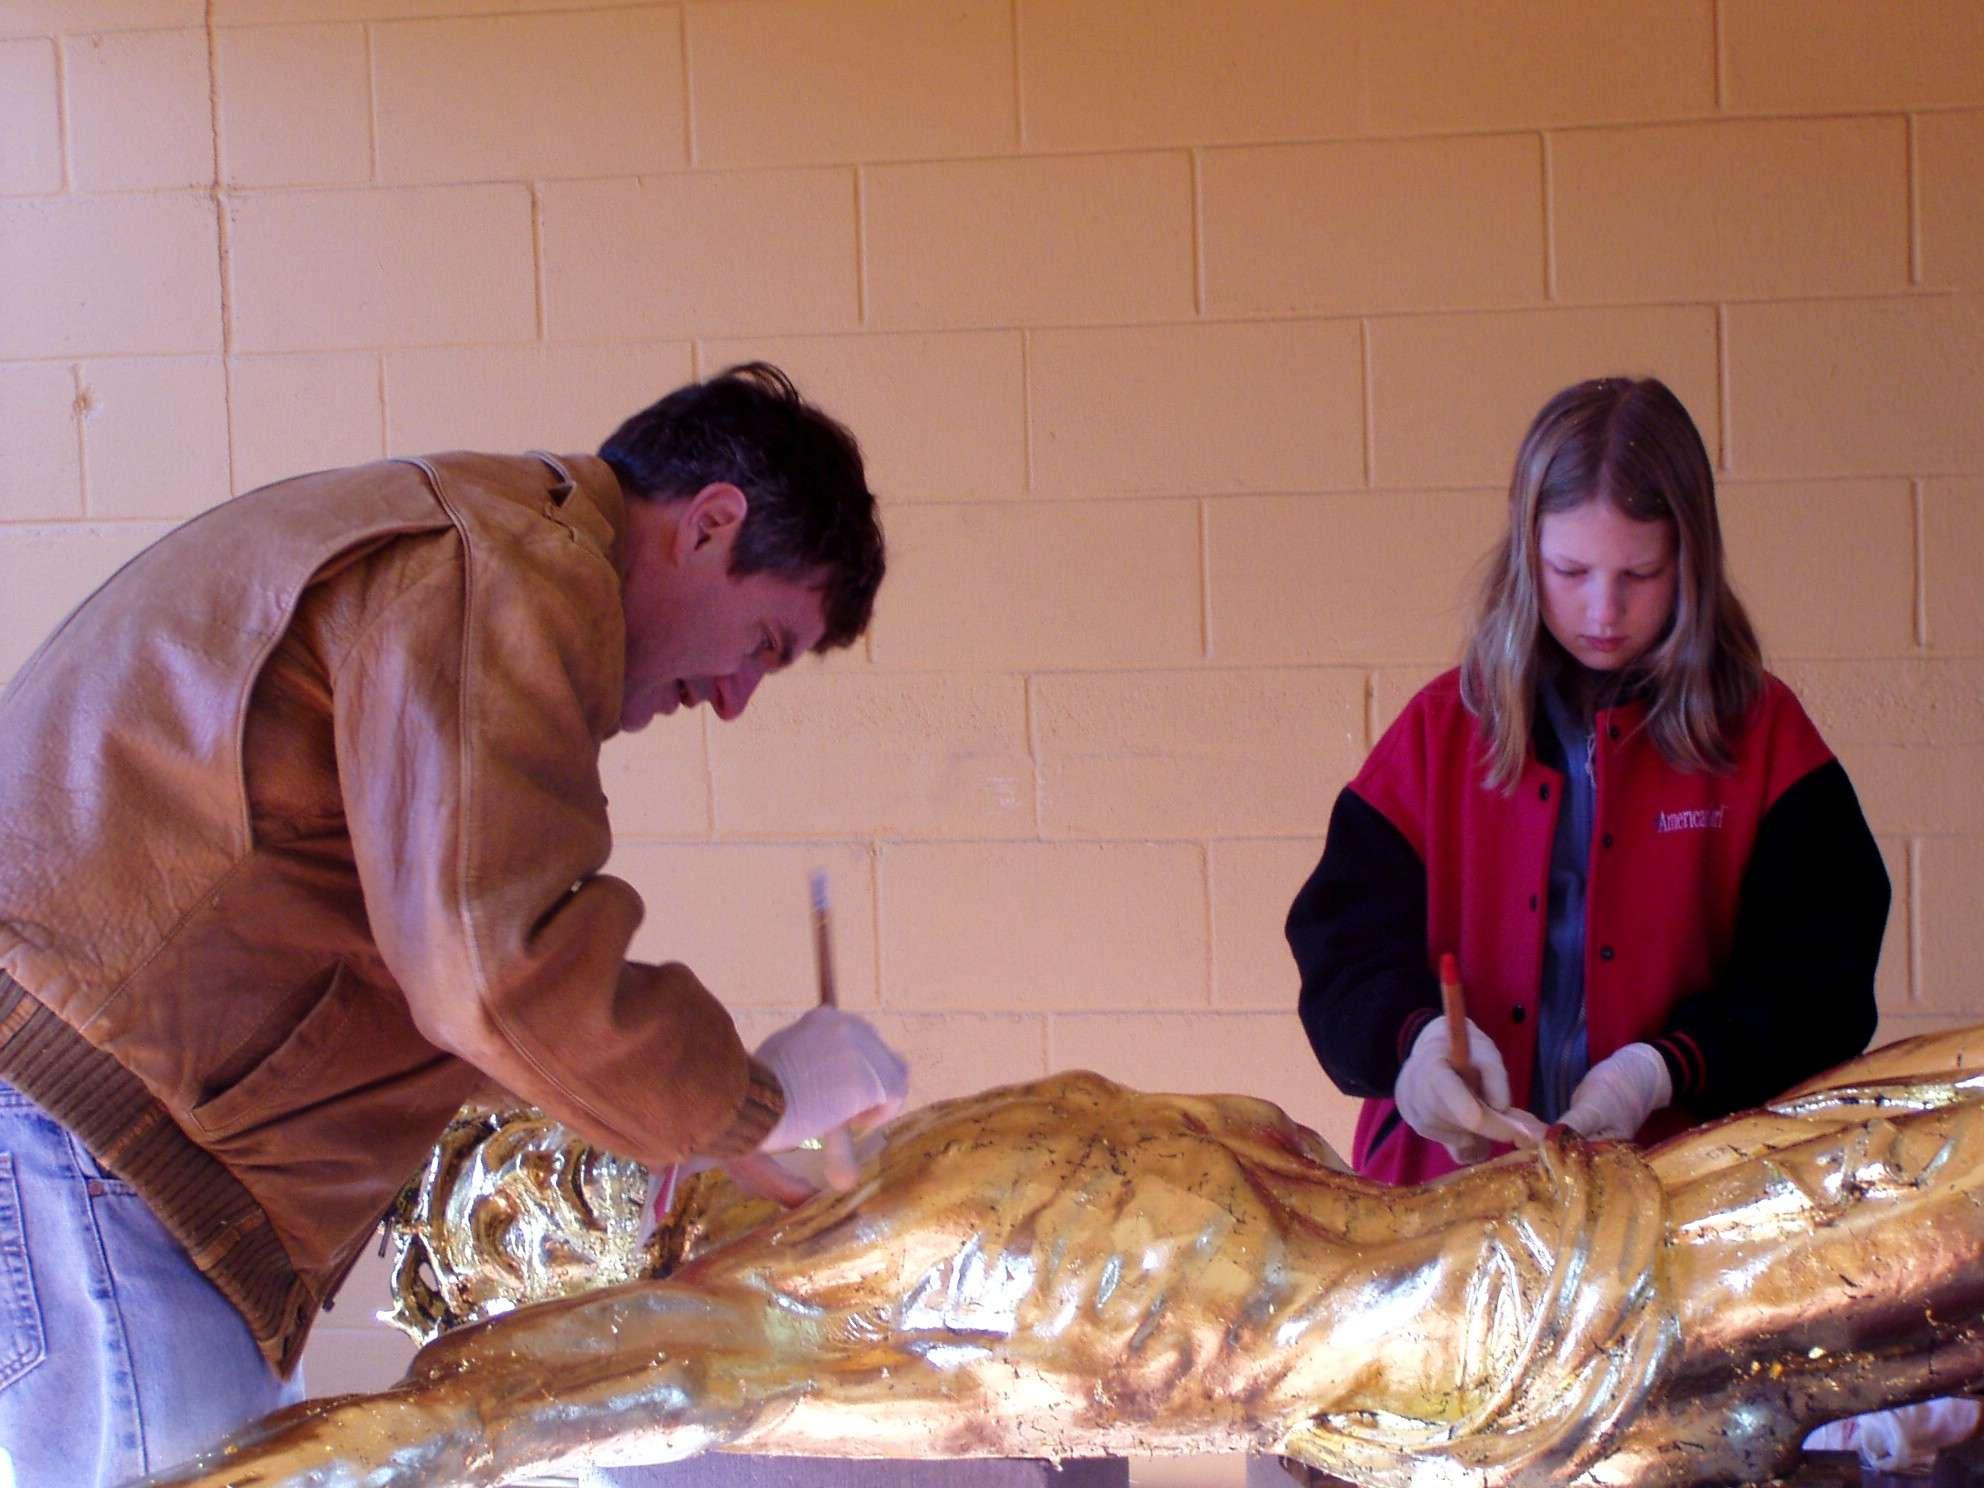 victorious christ restoration albin polasek museum u0026 sculpture